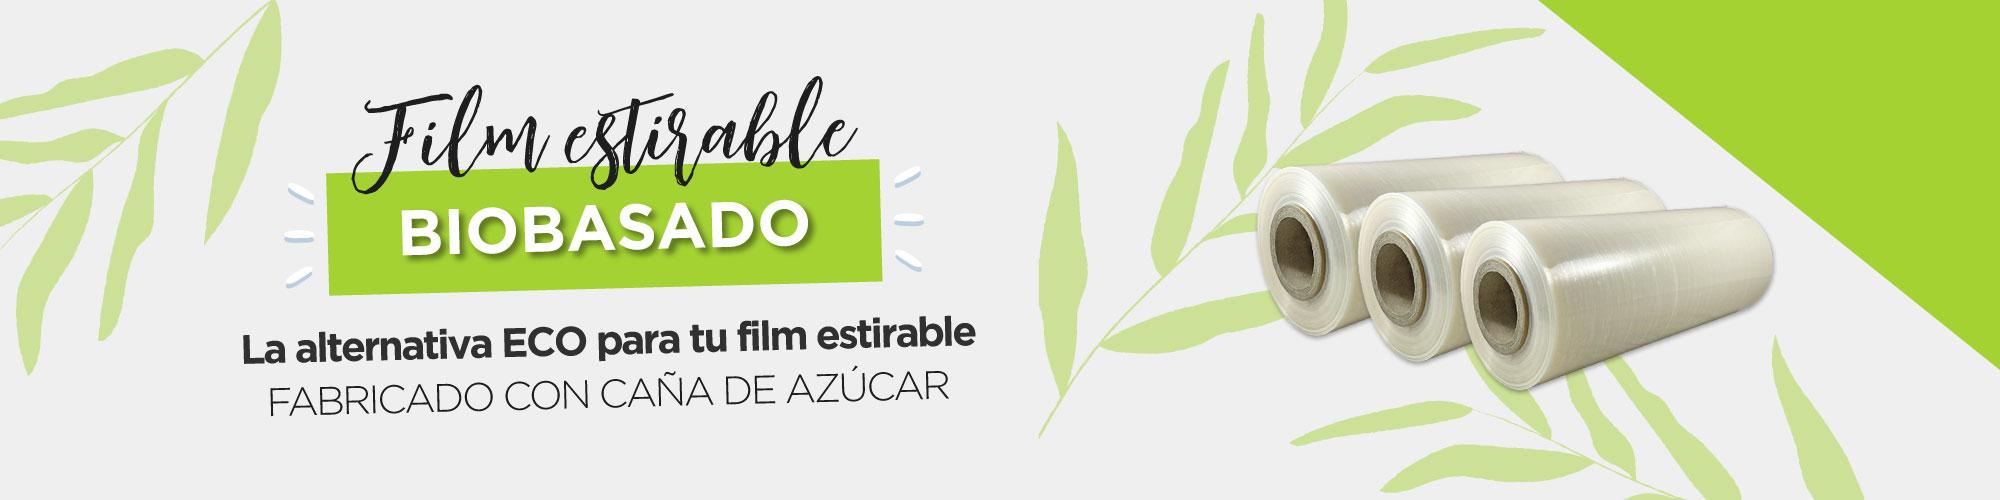 venta film eco biobasado